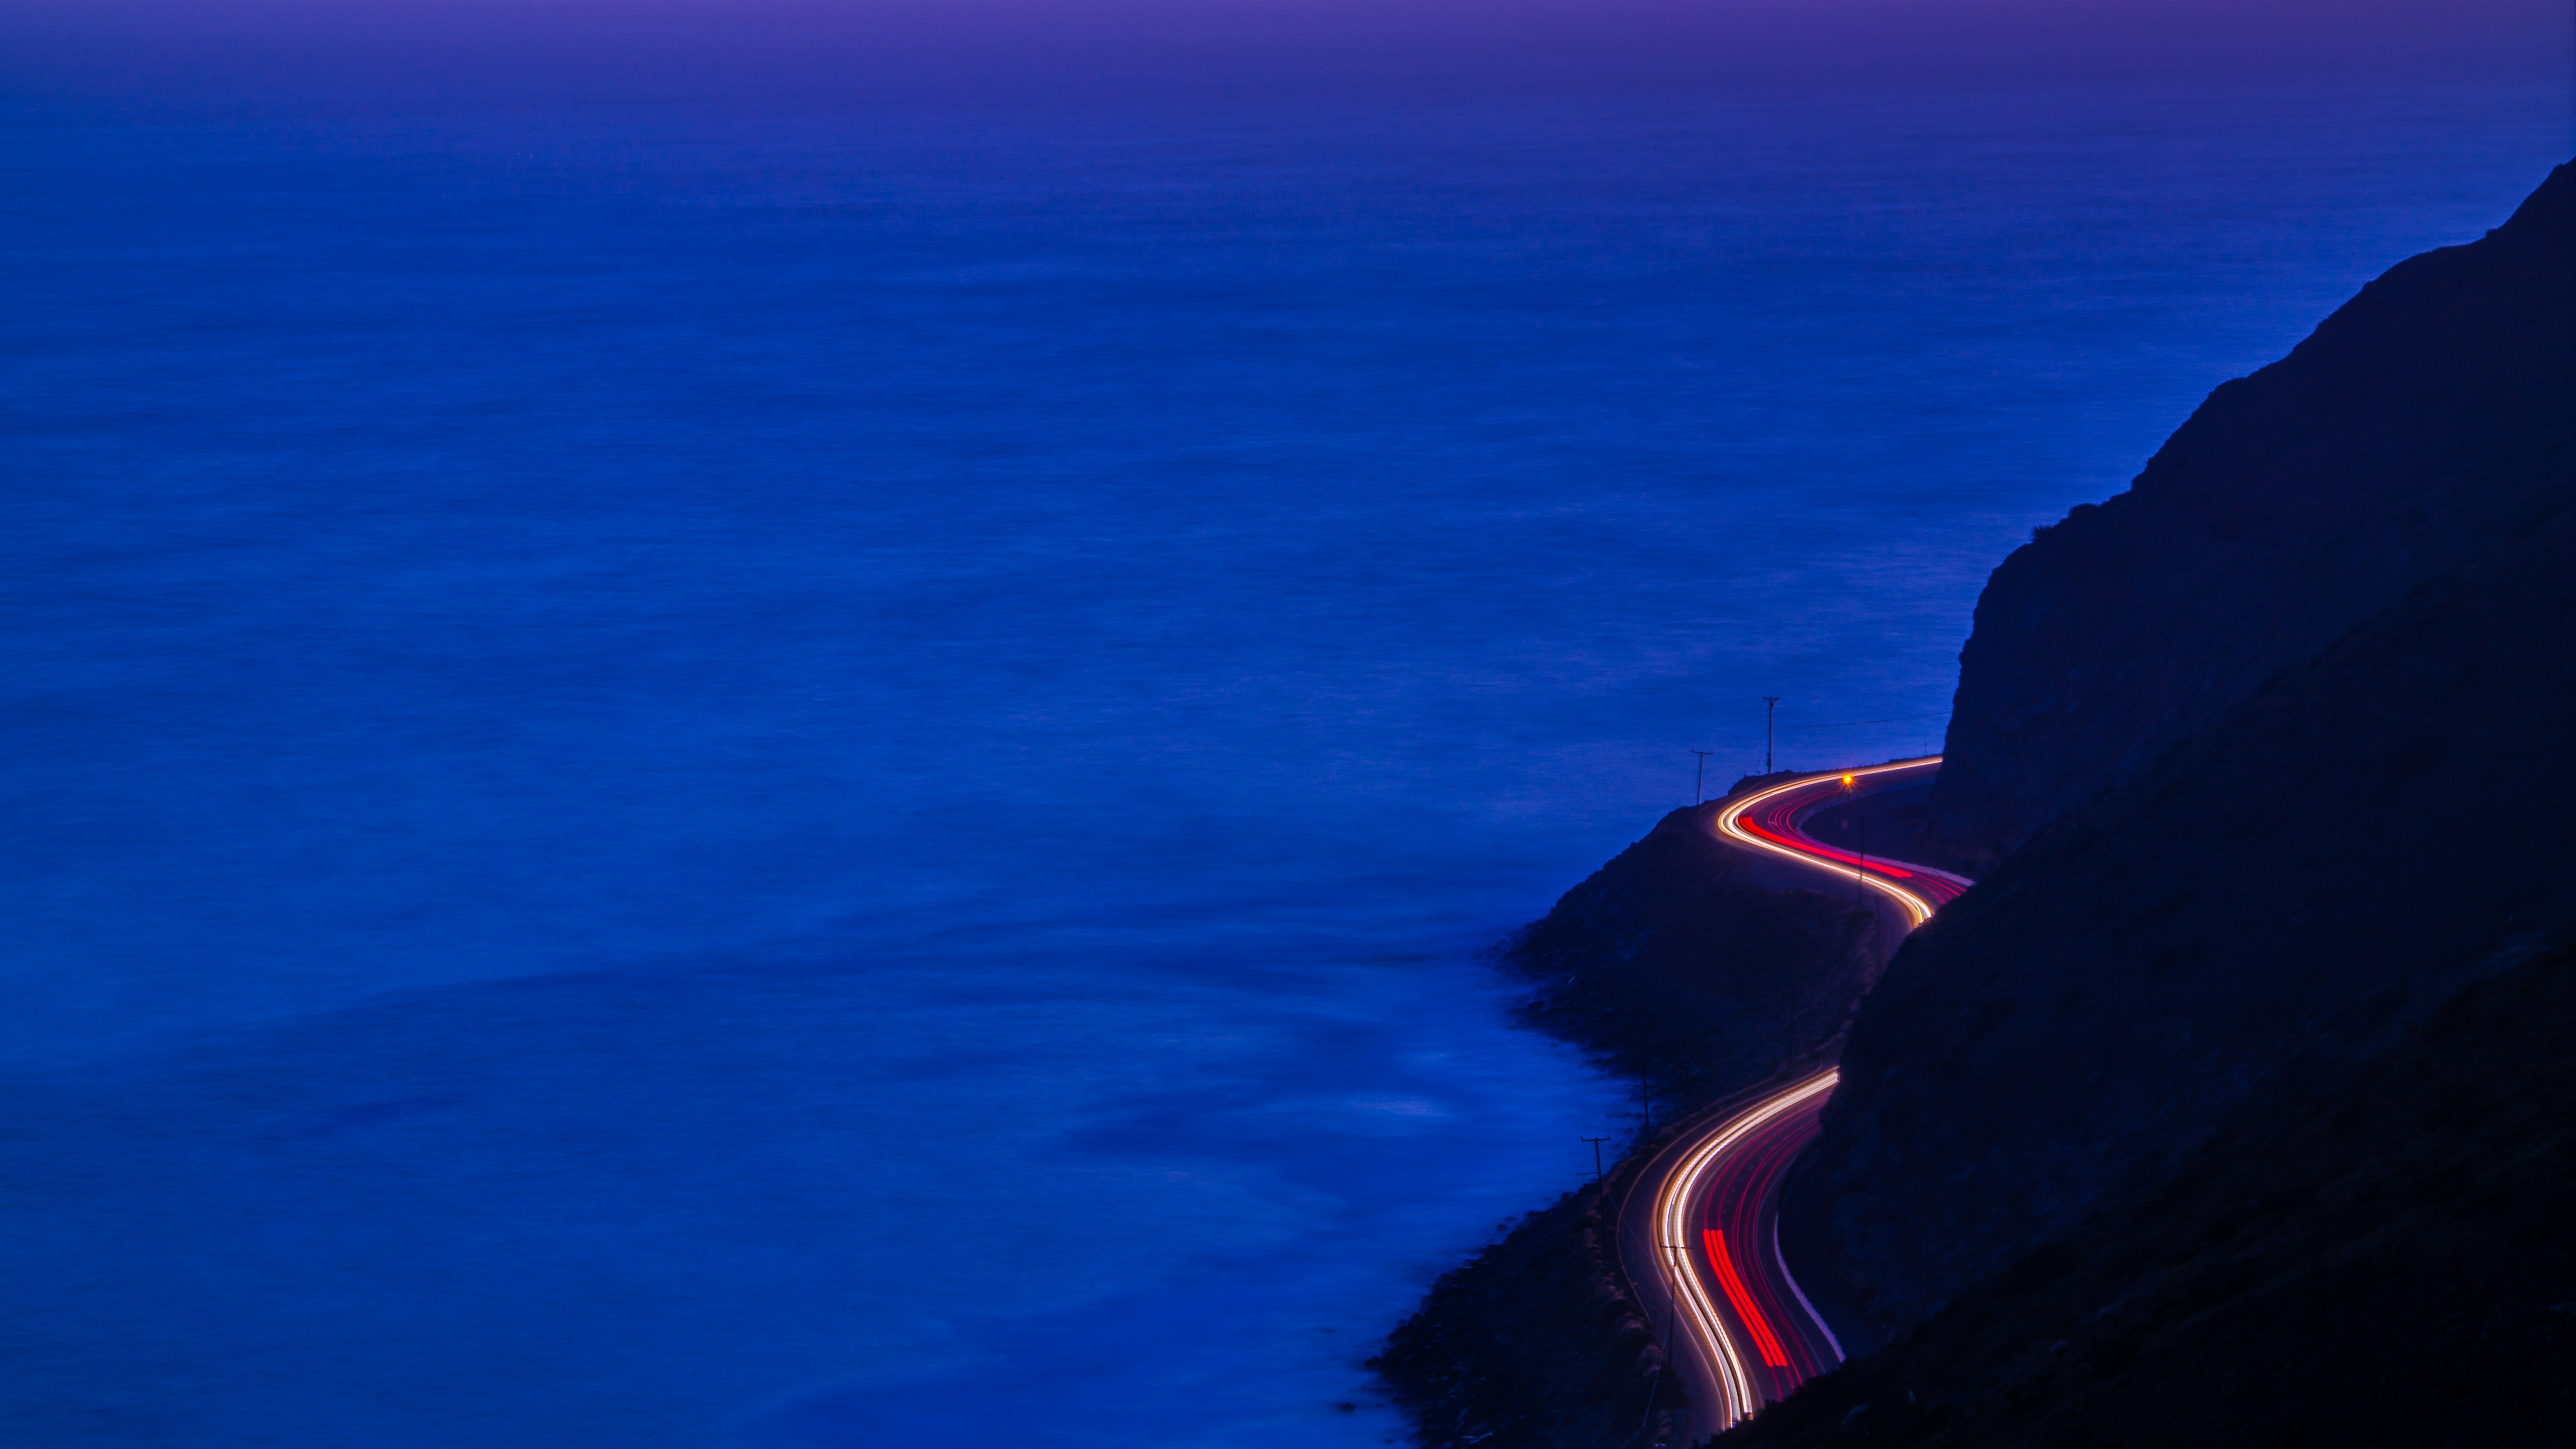 Coastline Night Road 5120x2880